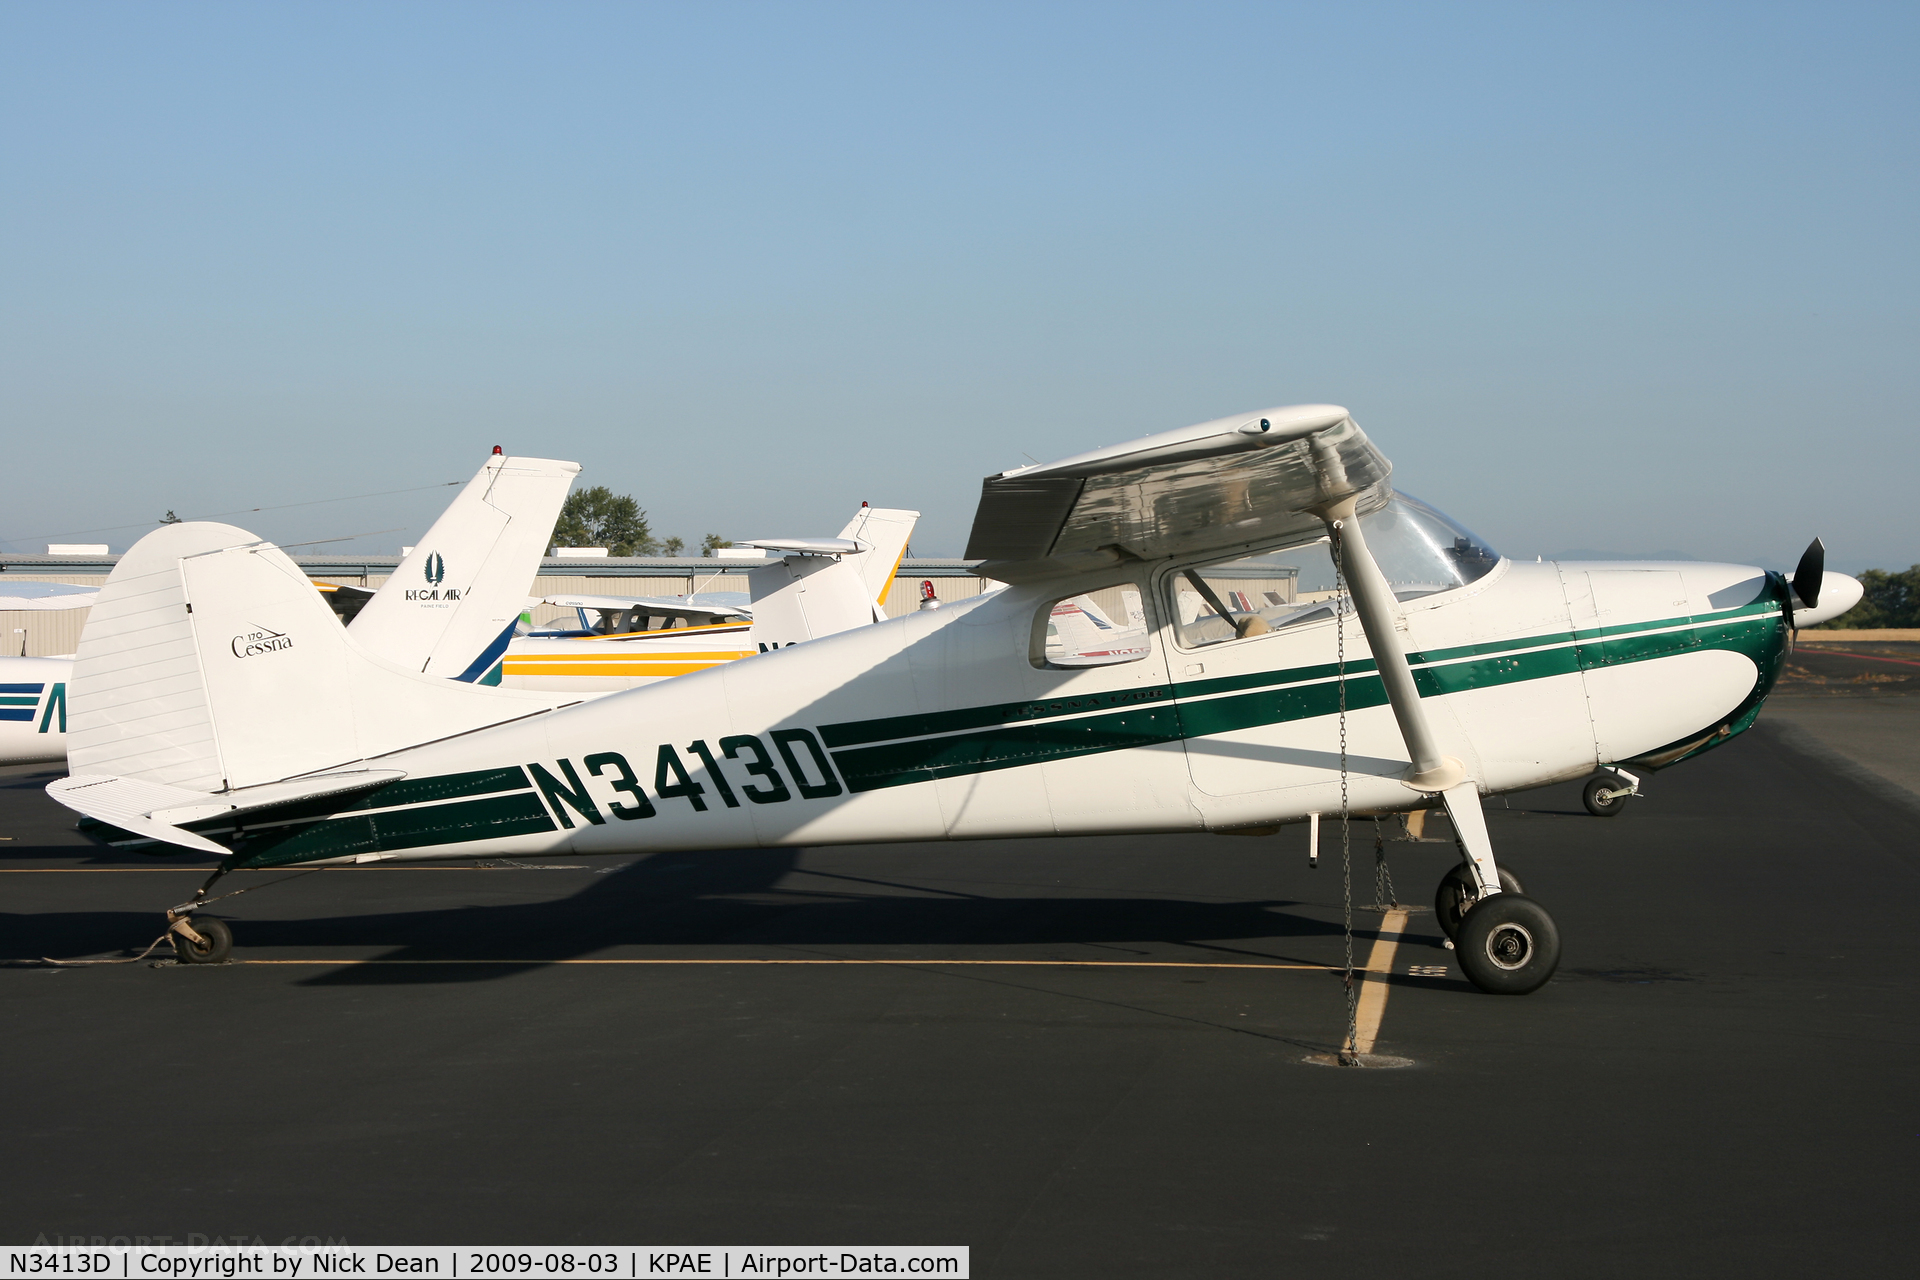 N3413D, 1955 Cessna 170B C/N 26956, KPAE